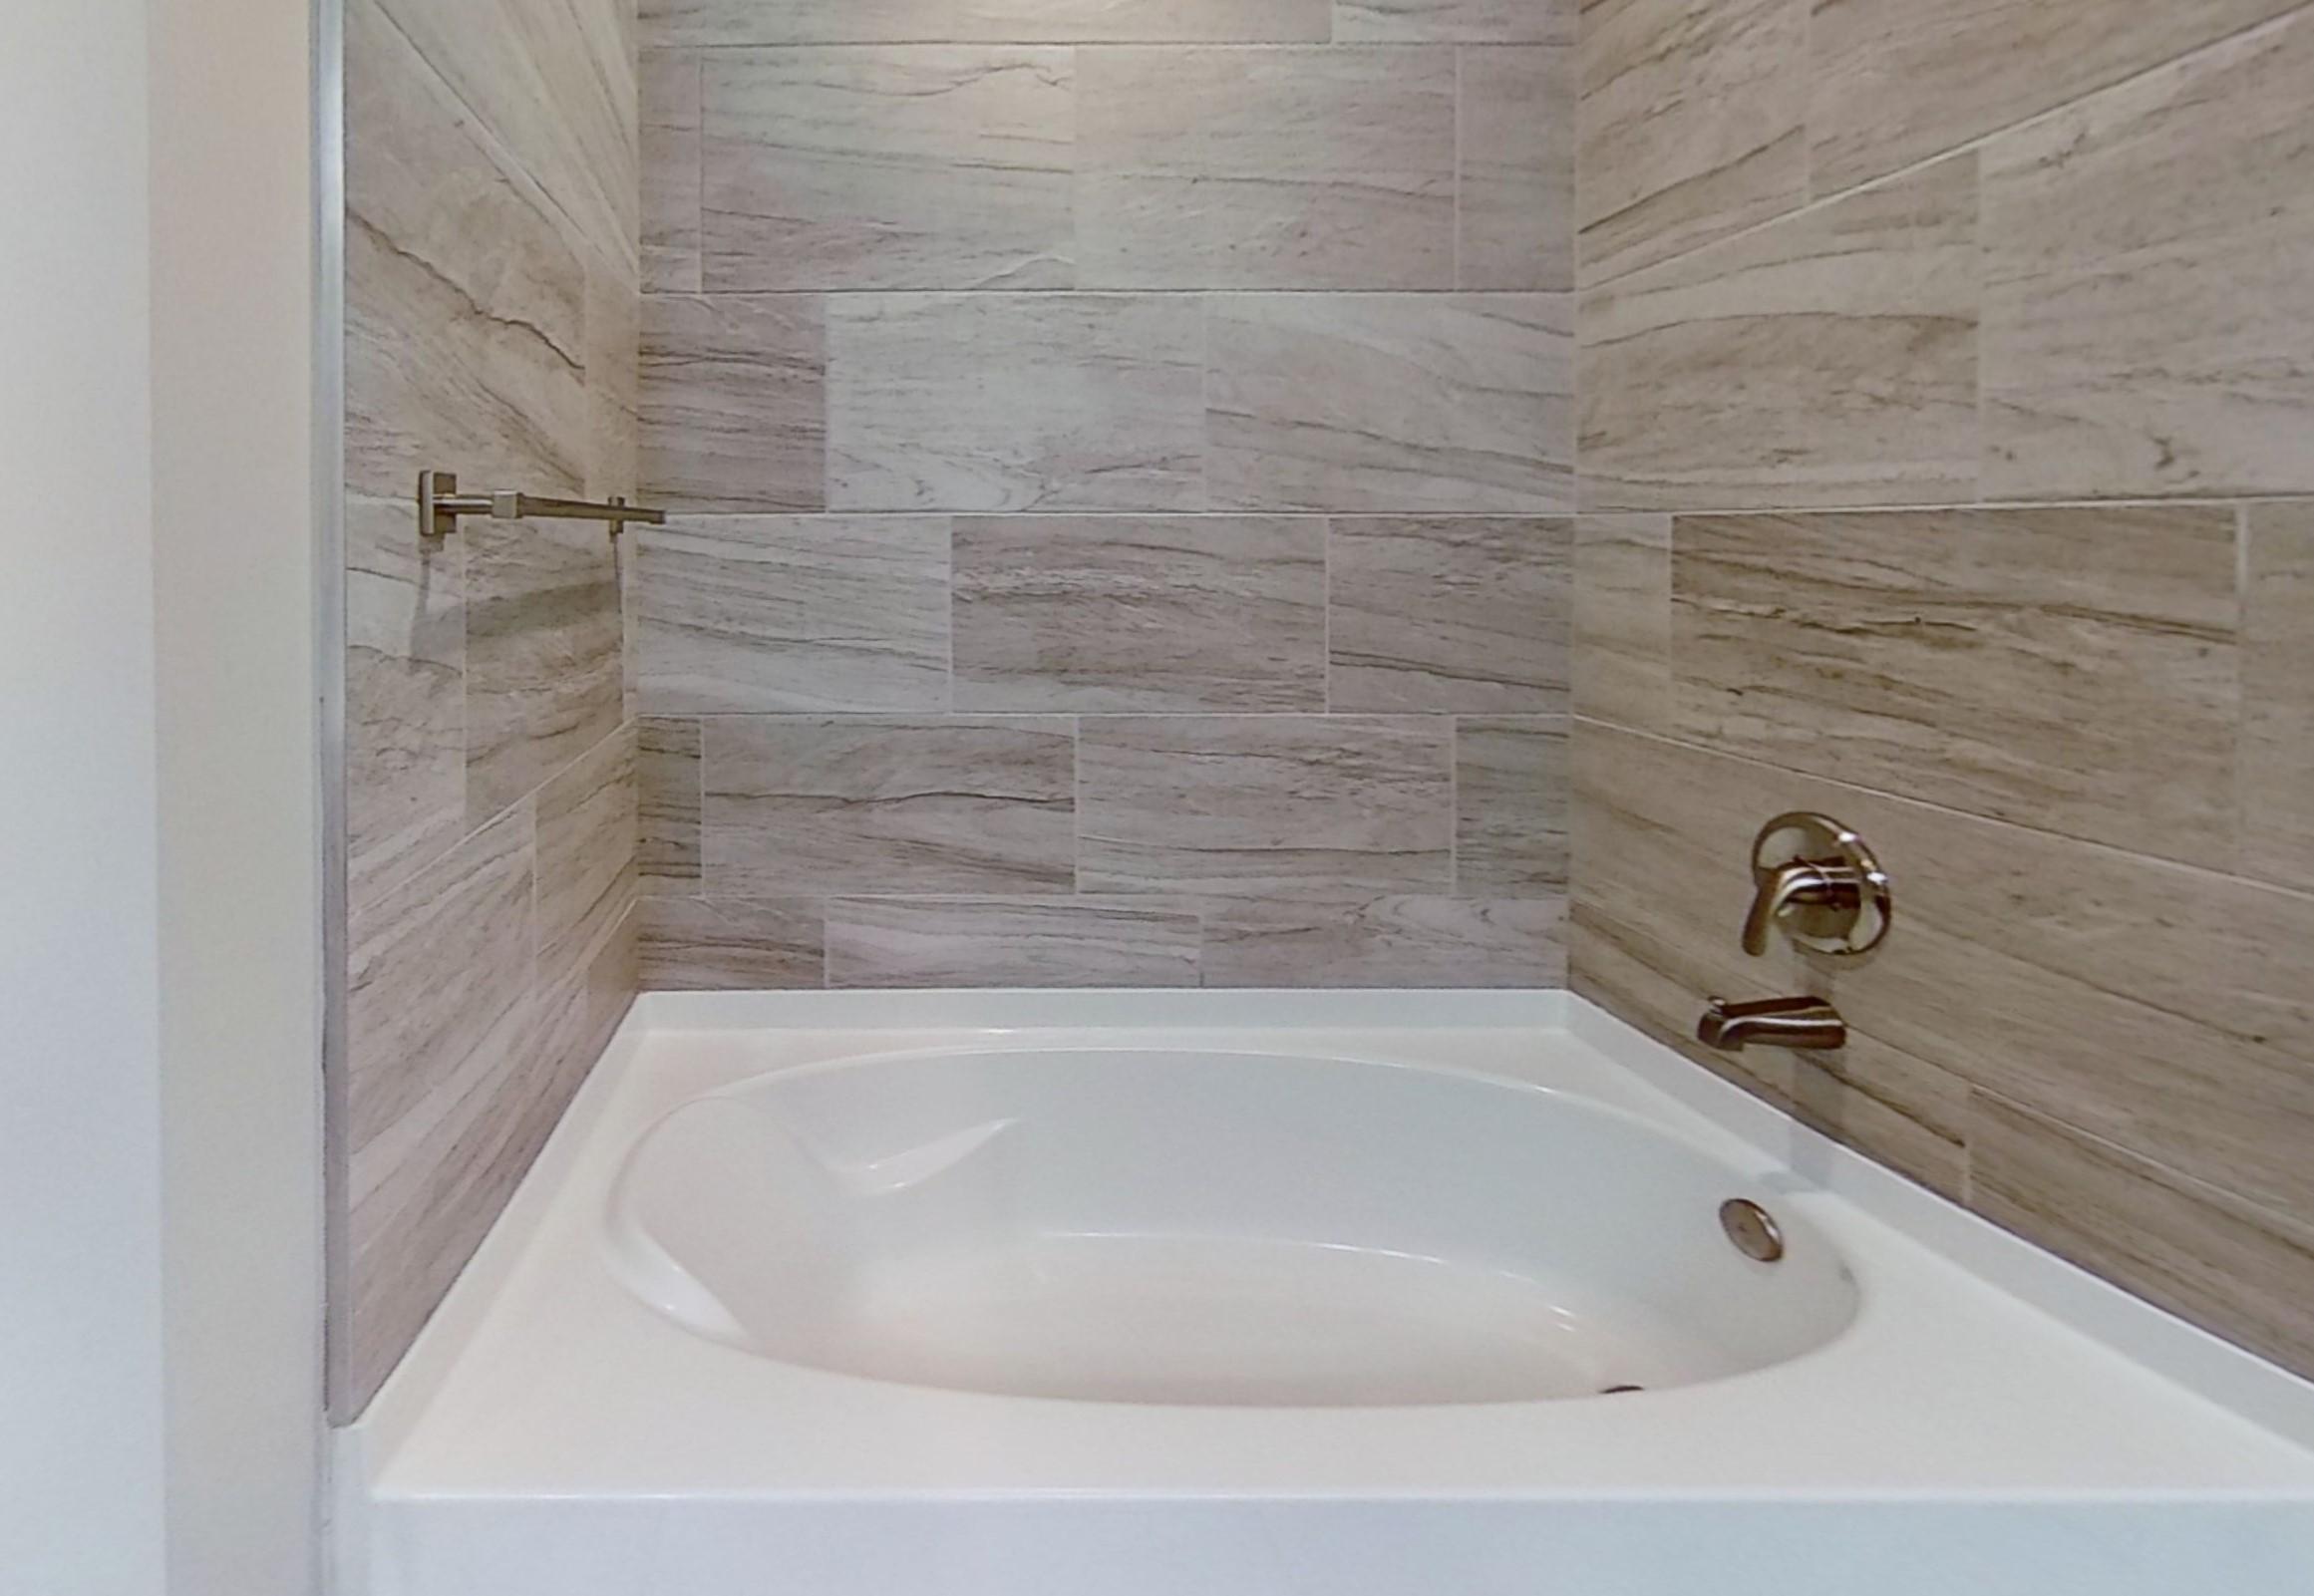 B4 Bathroom at the Vue at Creve Coeur Apartments in Creve Coeur, MO